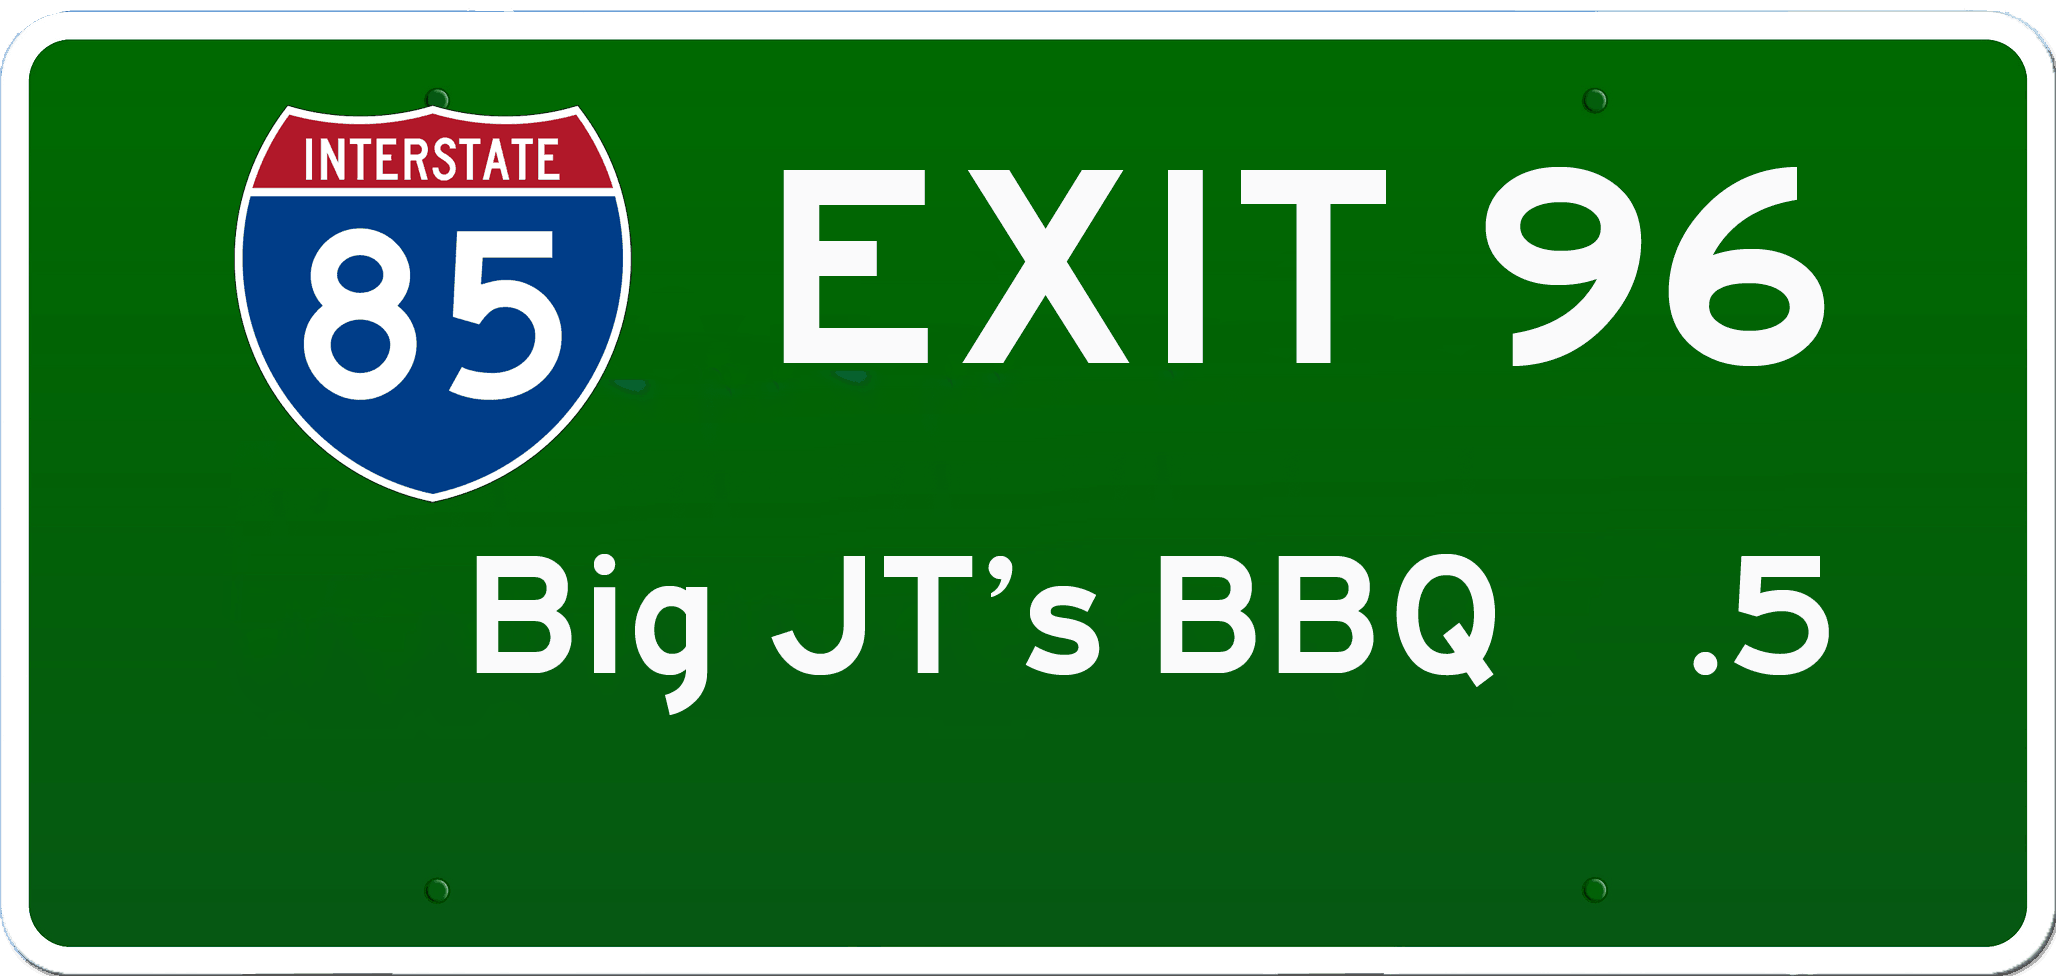 SC BBQ on I-85 at Exit 96